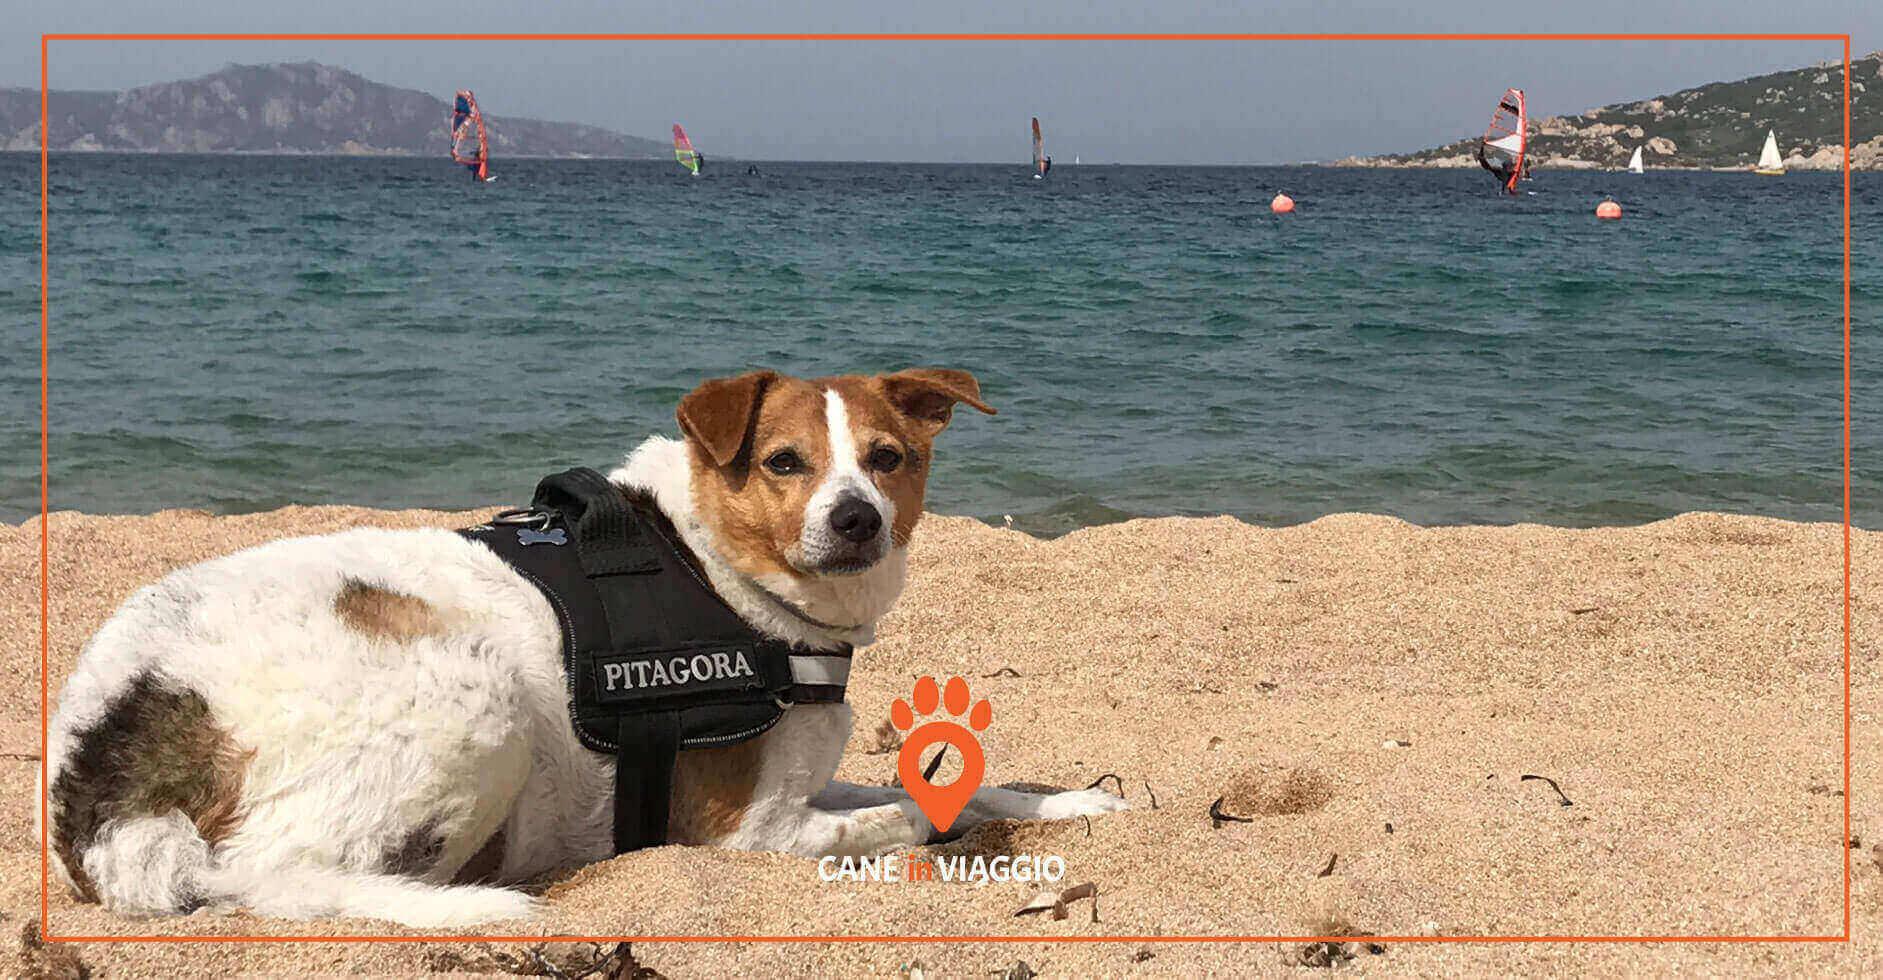 cane e spiaggia, meta di trekking in sardegna